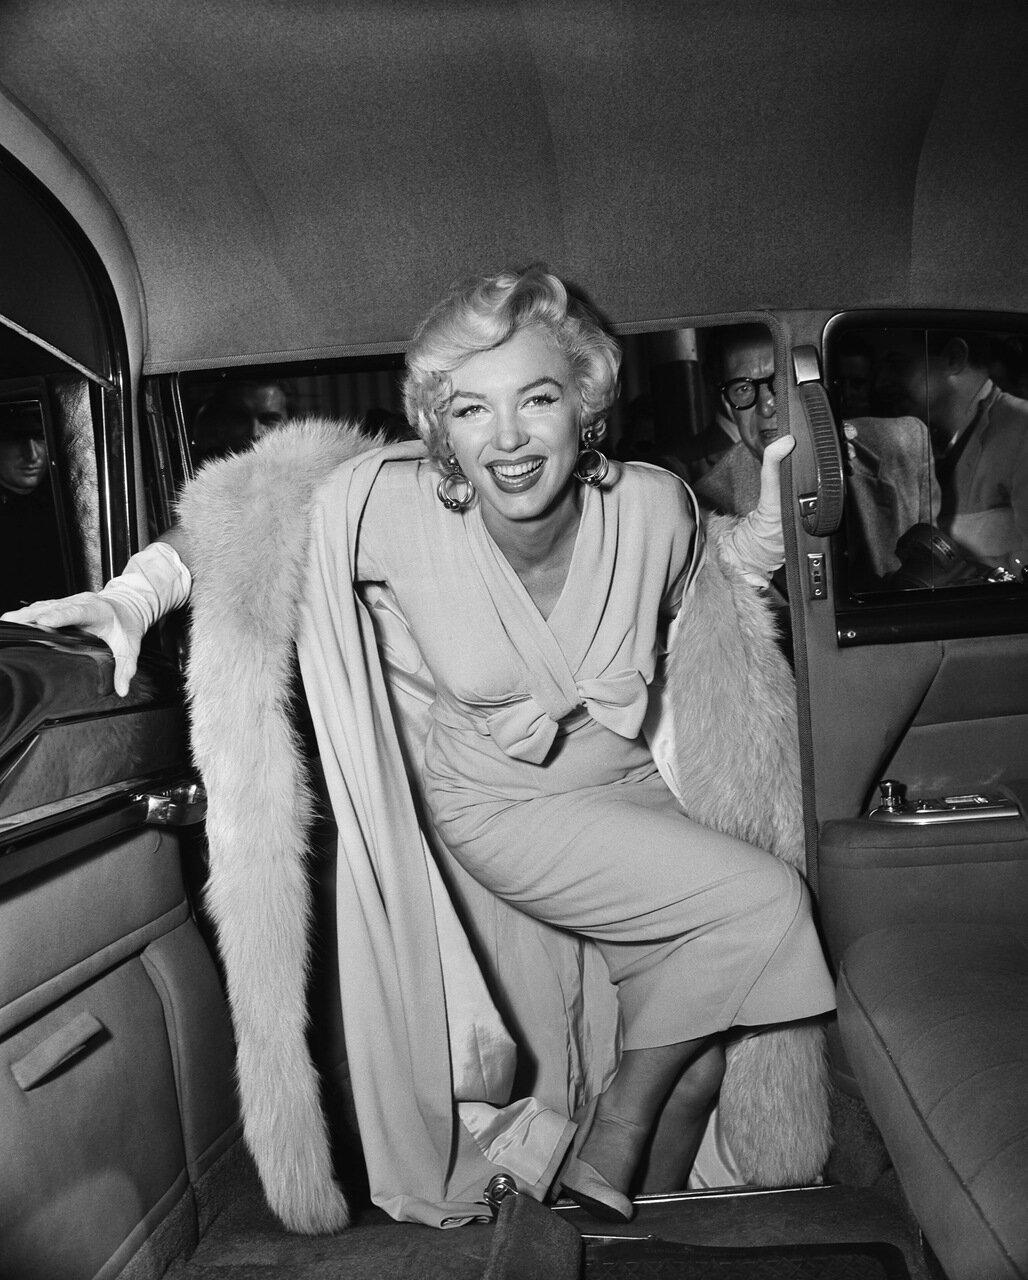 Marilyn Monroe Boarding a Car